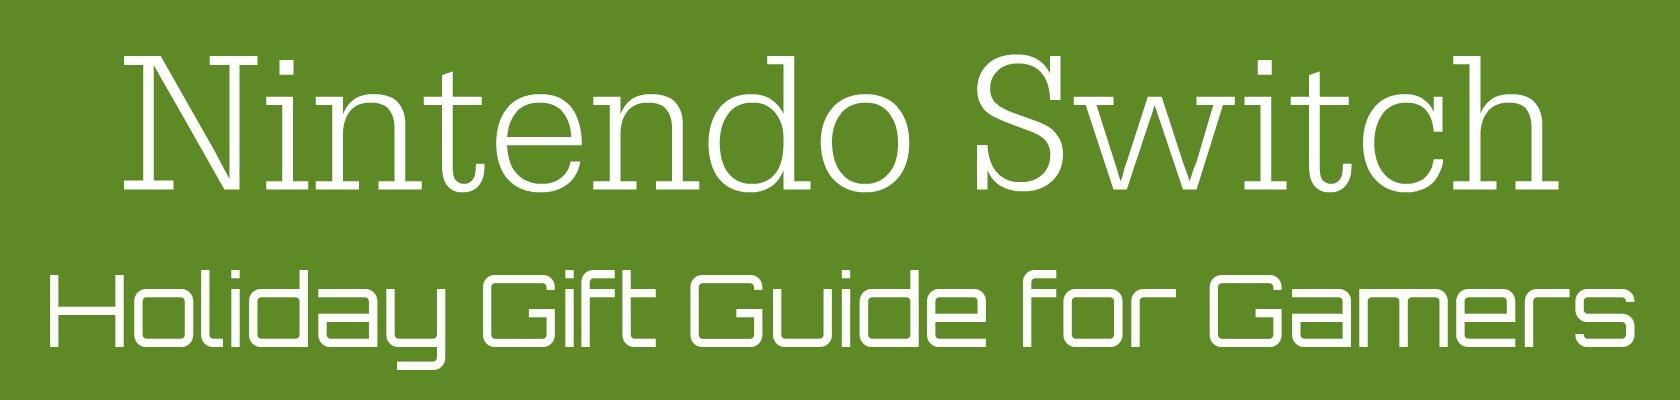 Nintendo Switch gift guide